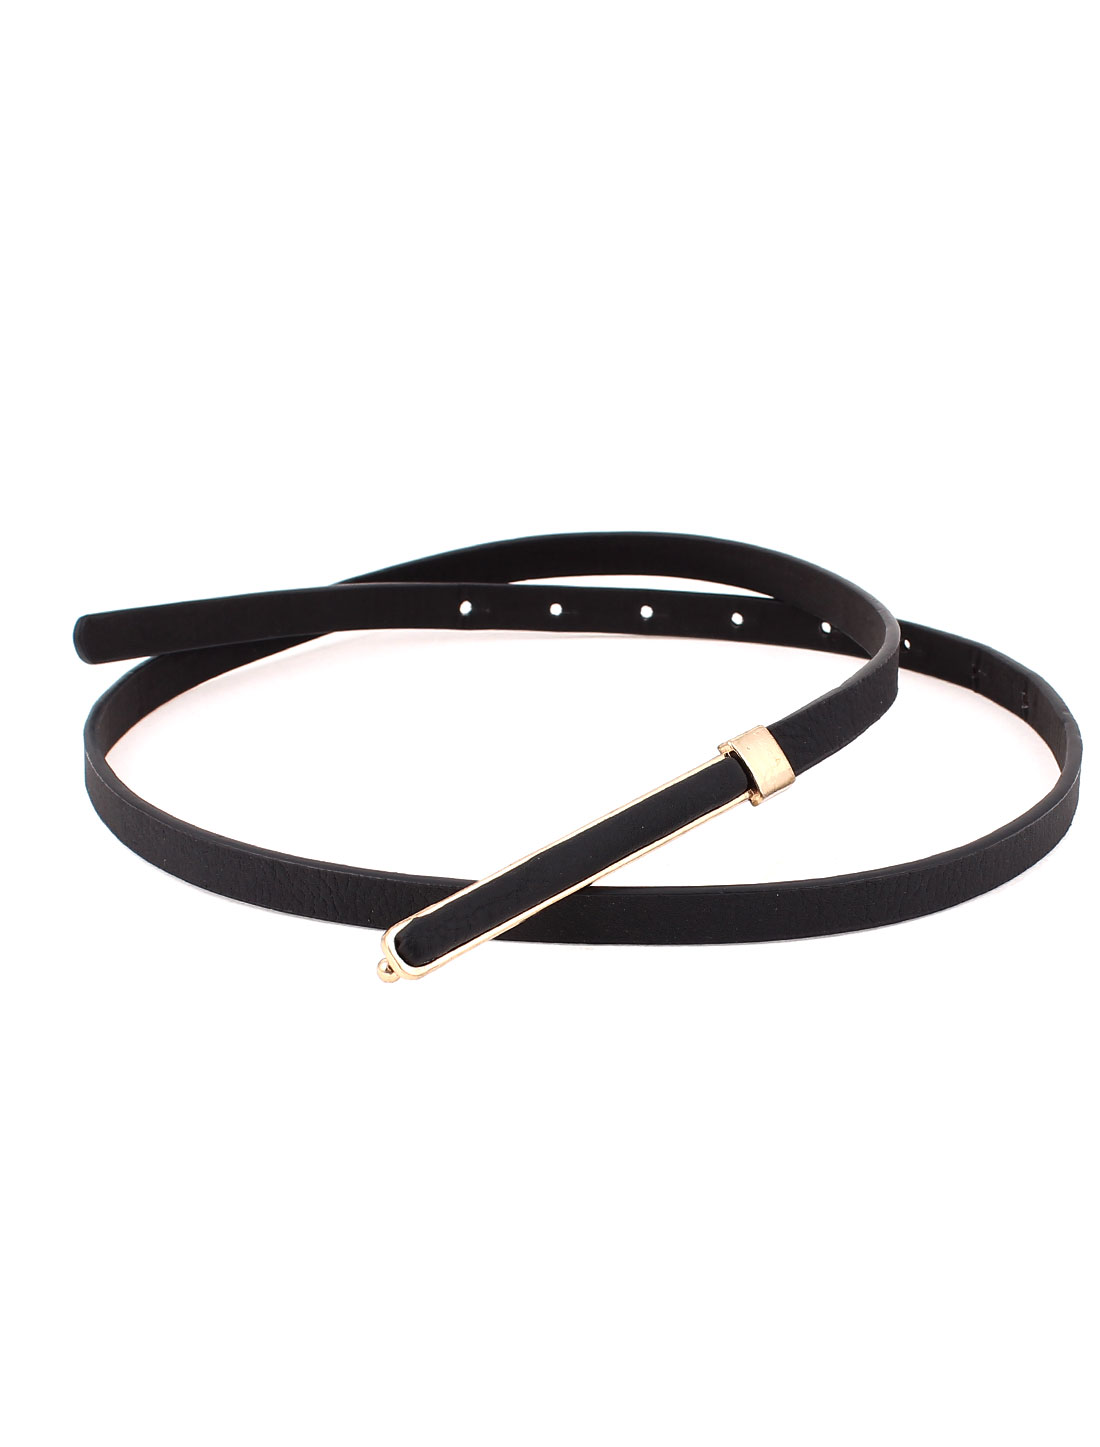 Lady Metal Press Buckle Skinny Cinch Thin Waist Belt Waistband Black